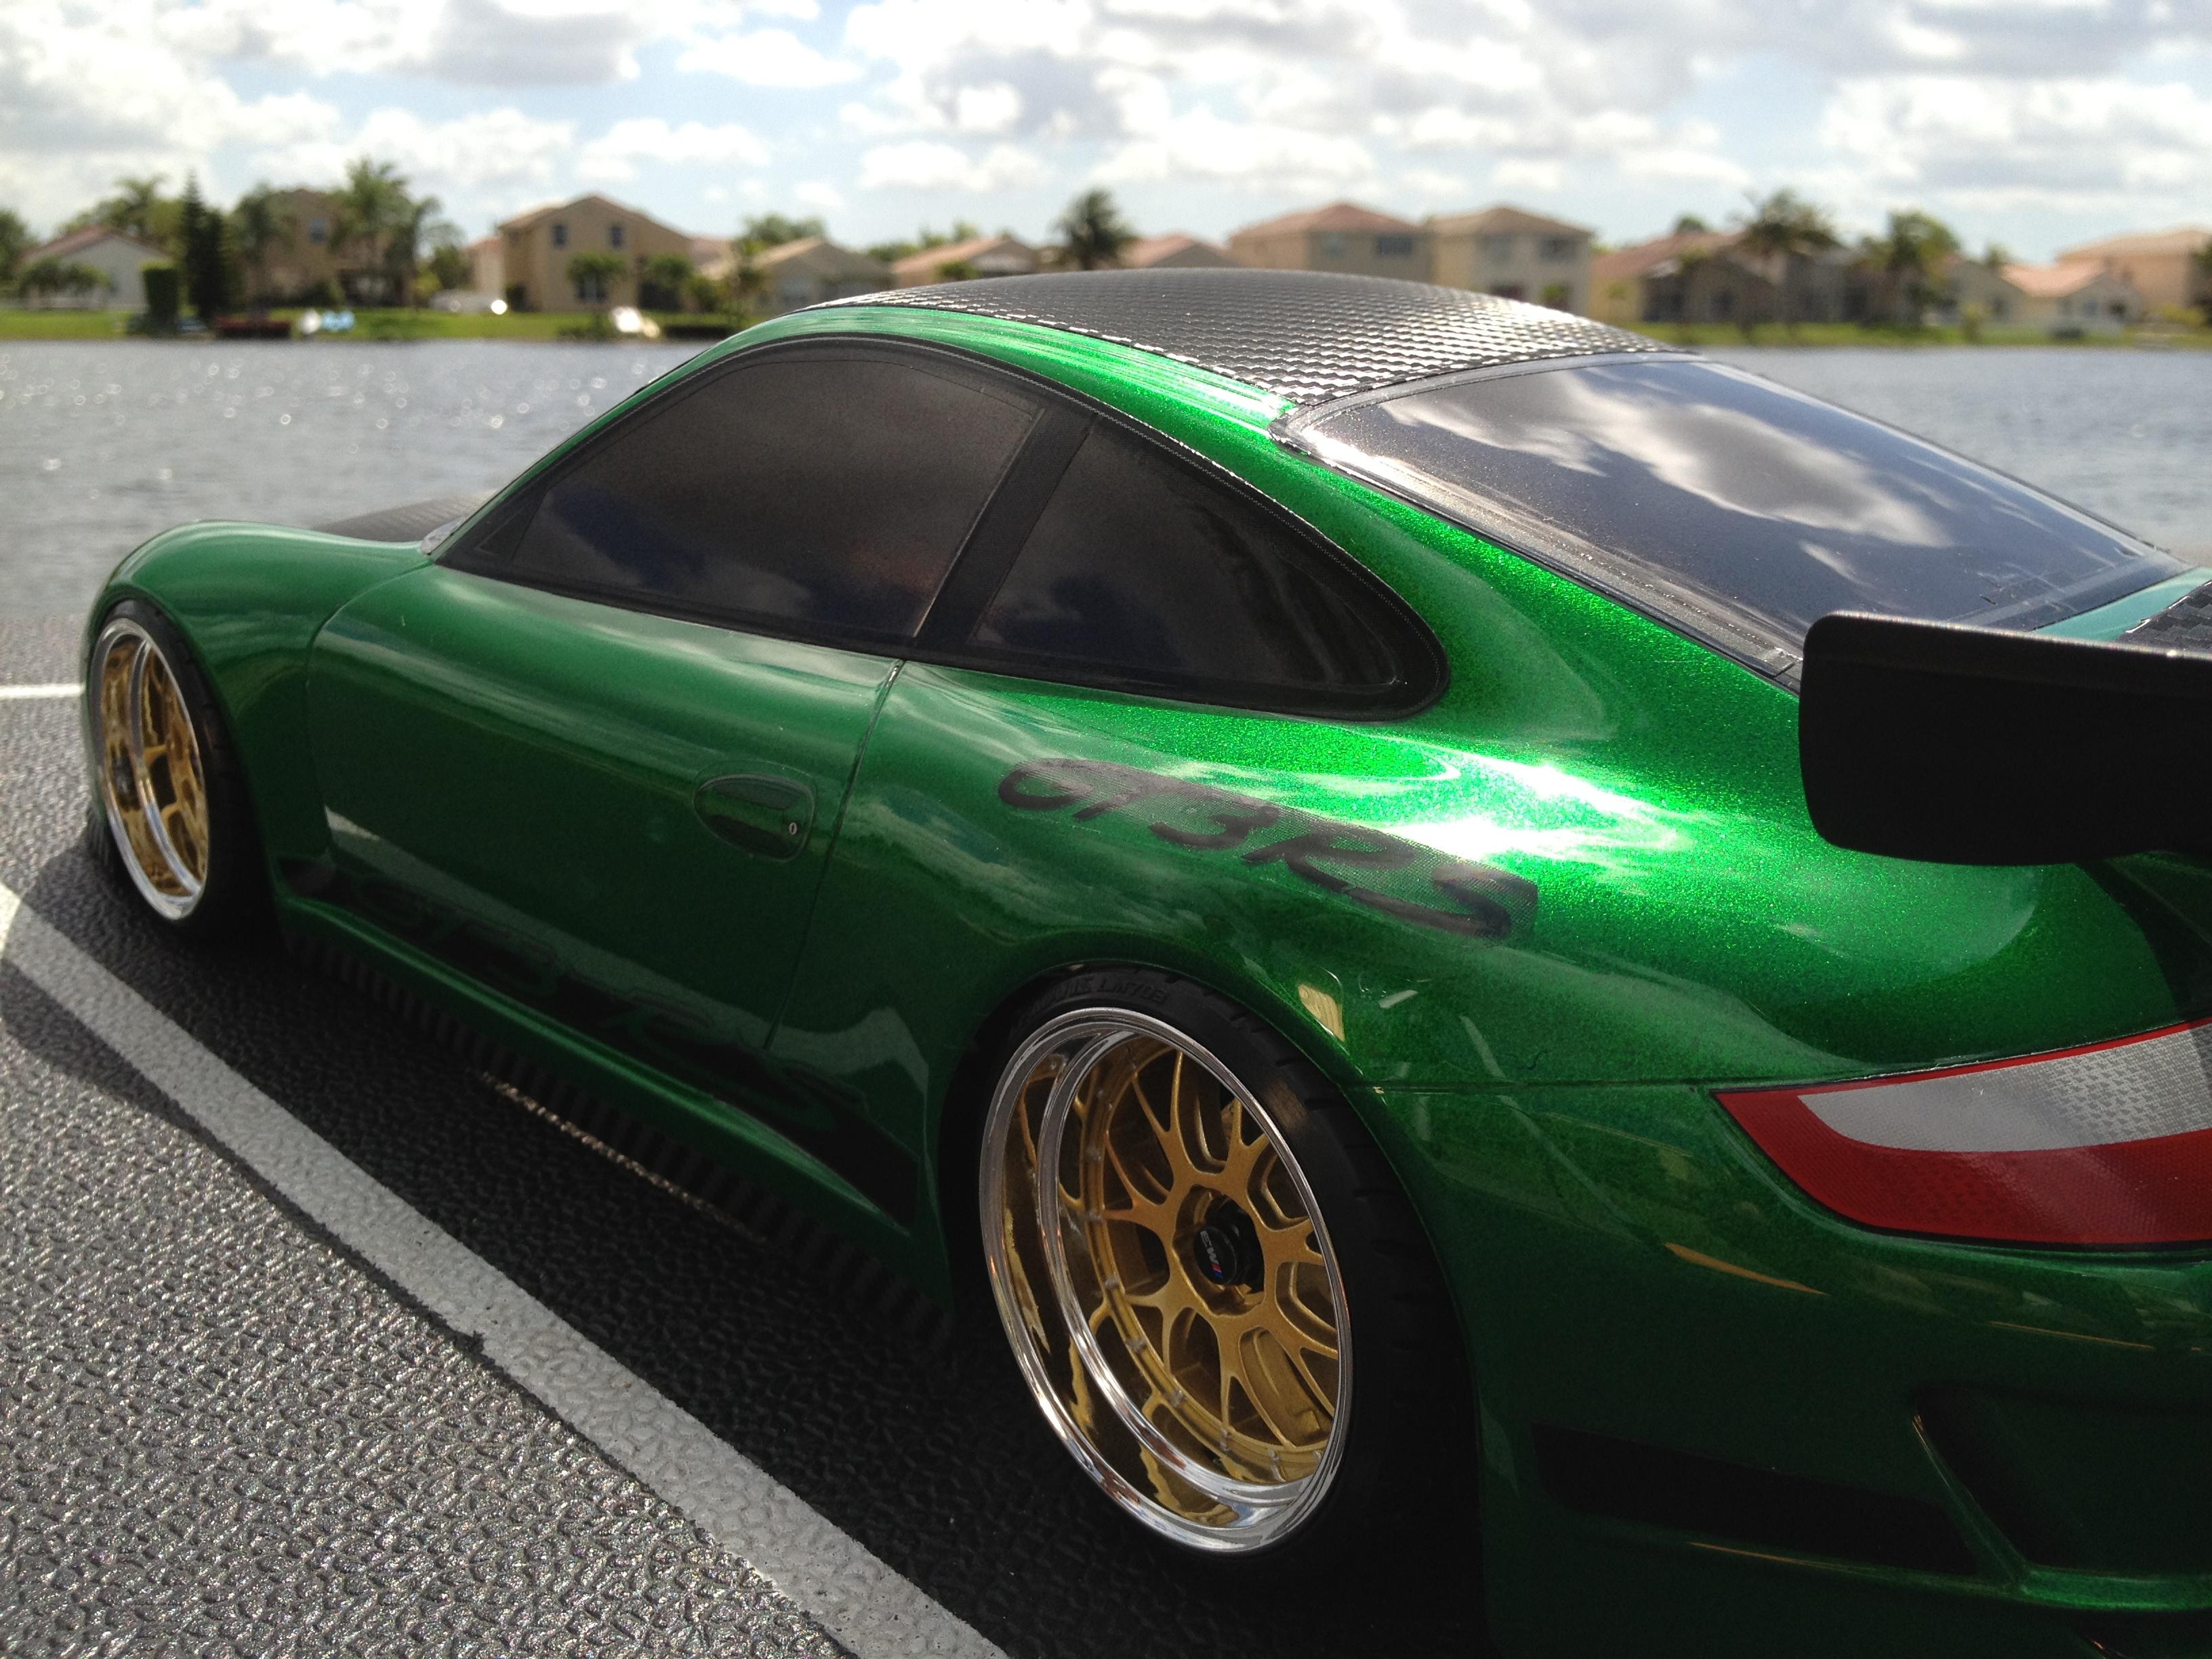 Audi icon